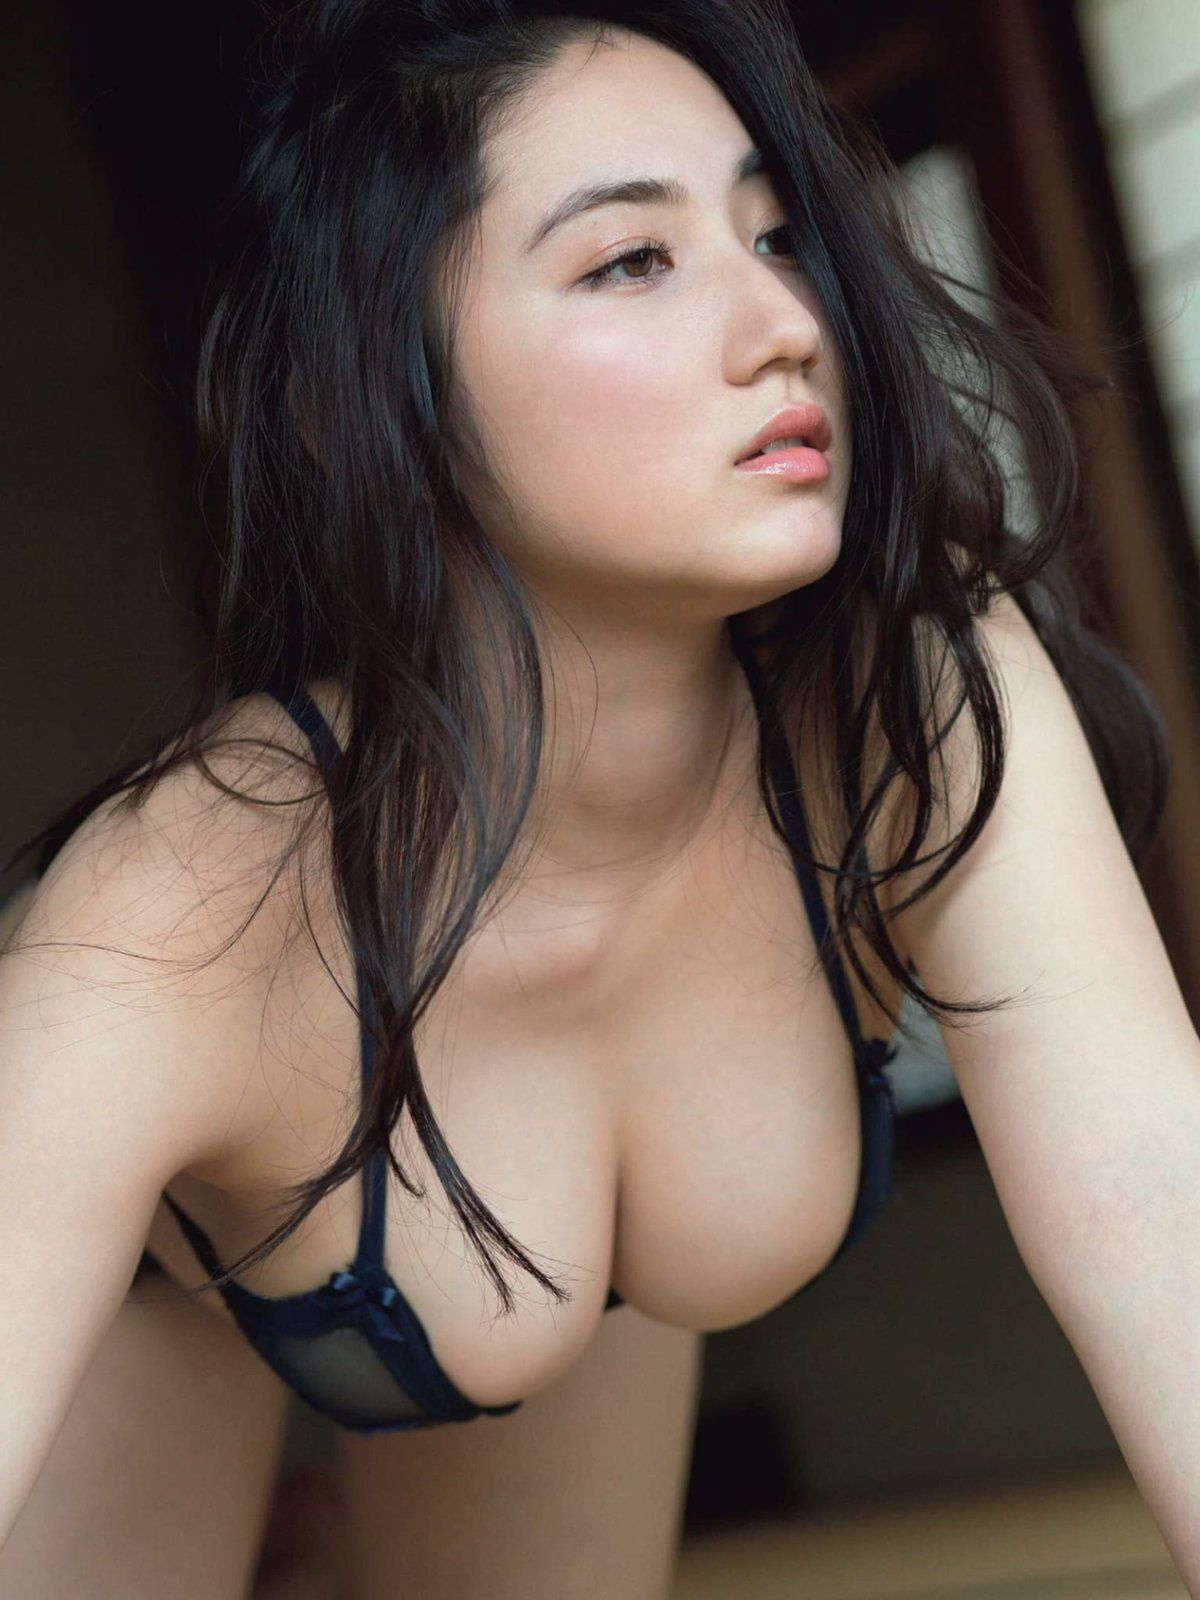 Saaya Irie  E5 85 A5 E6 B1 9f E7 B4 97 E7 B6 Be Scanlover 2 0 Discuss Jav Asian Beauties